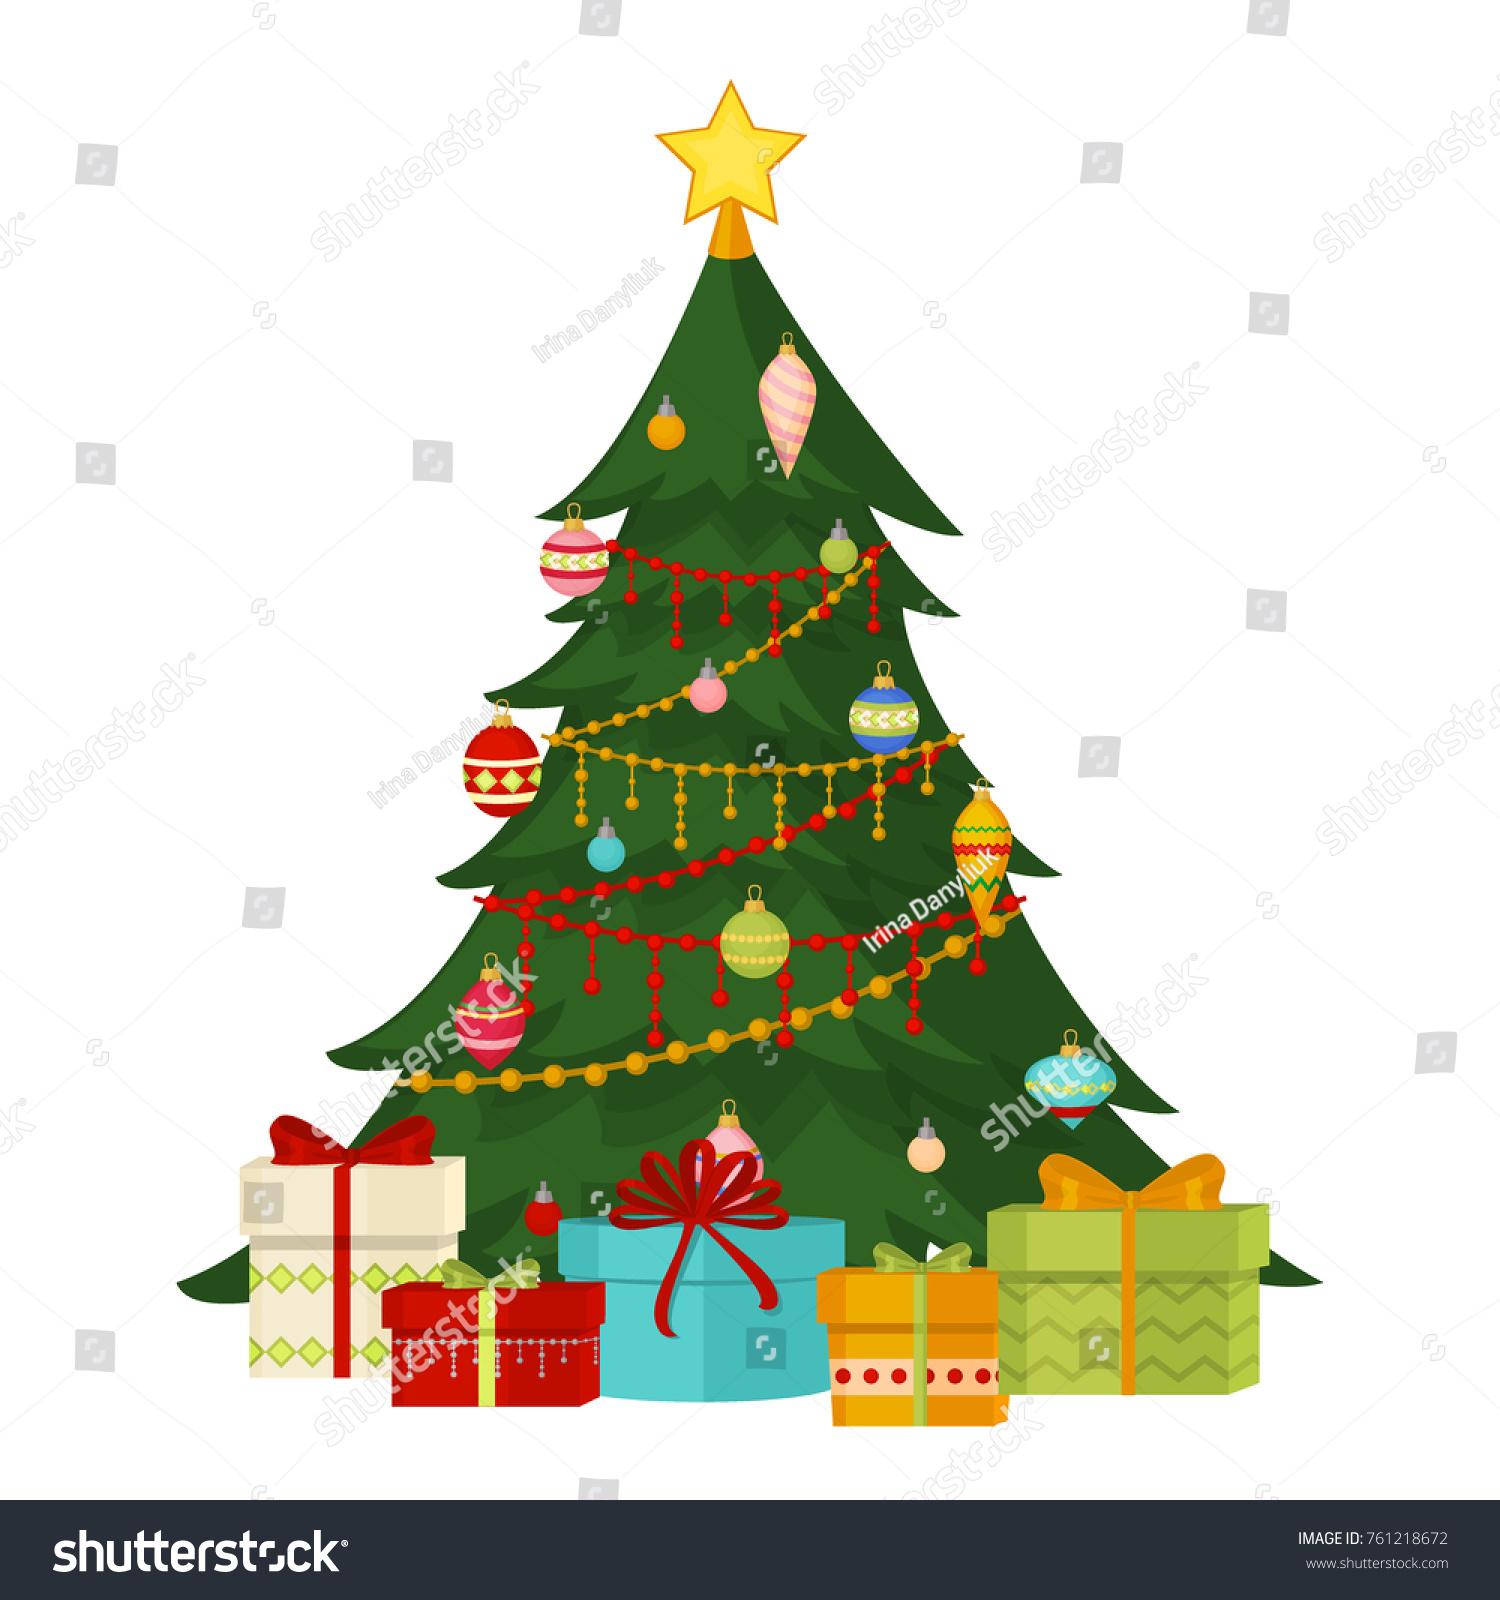 Christmas Tree Fir Gifts Balls Lights Stock Vector Royalty Free